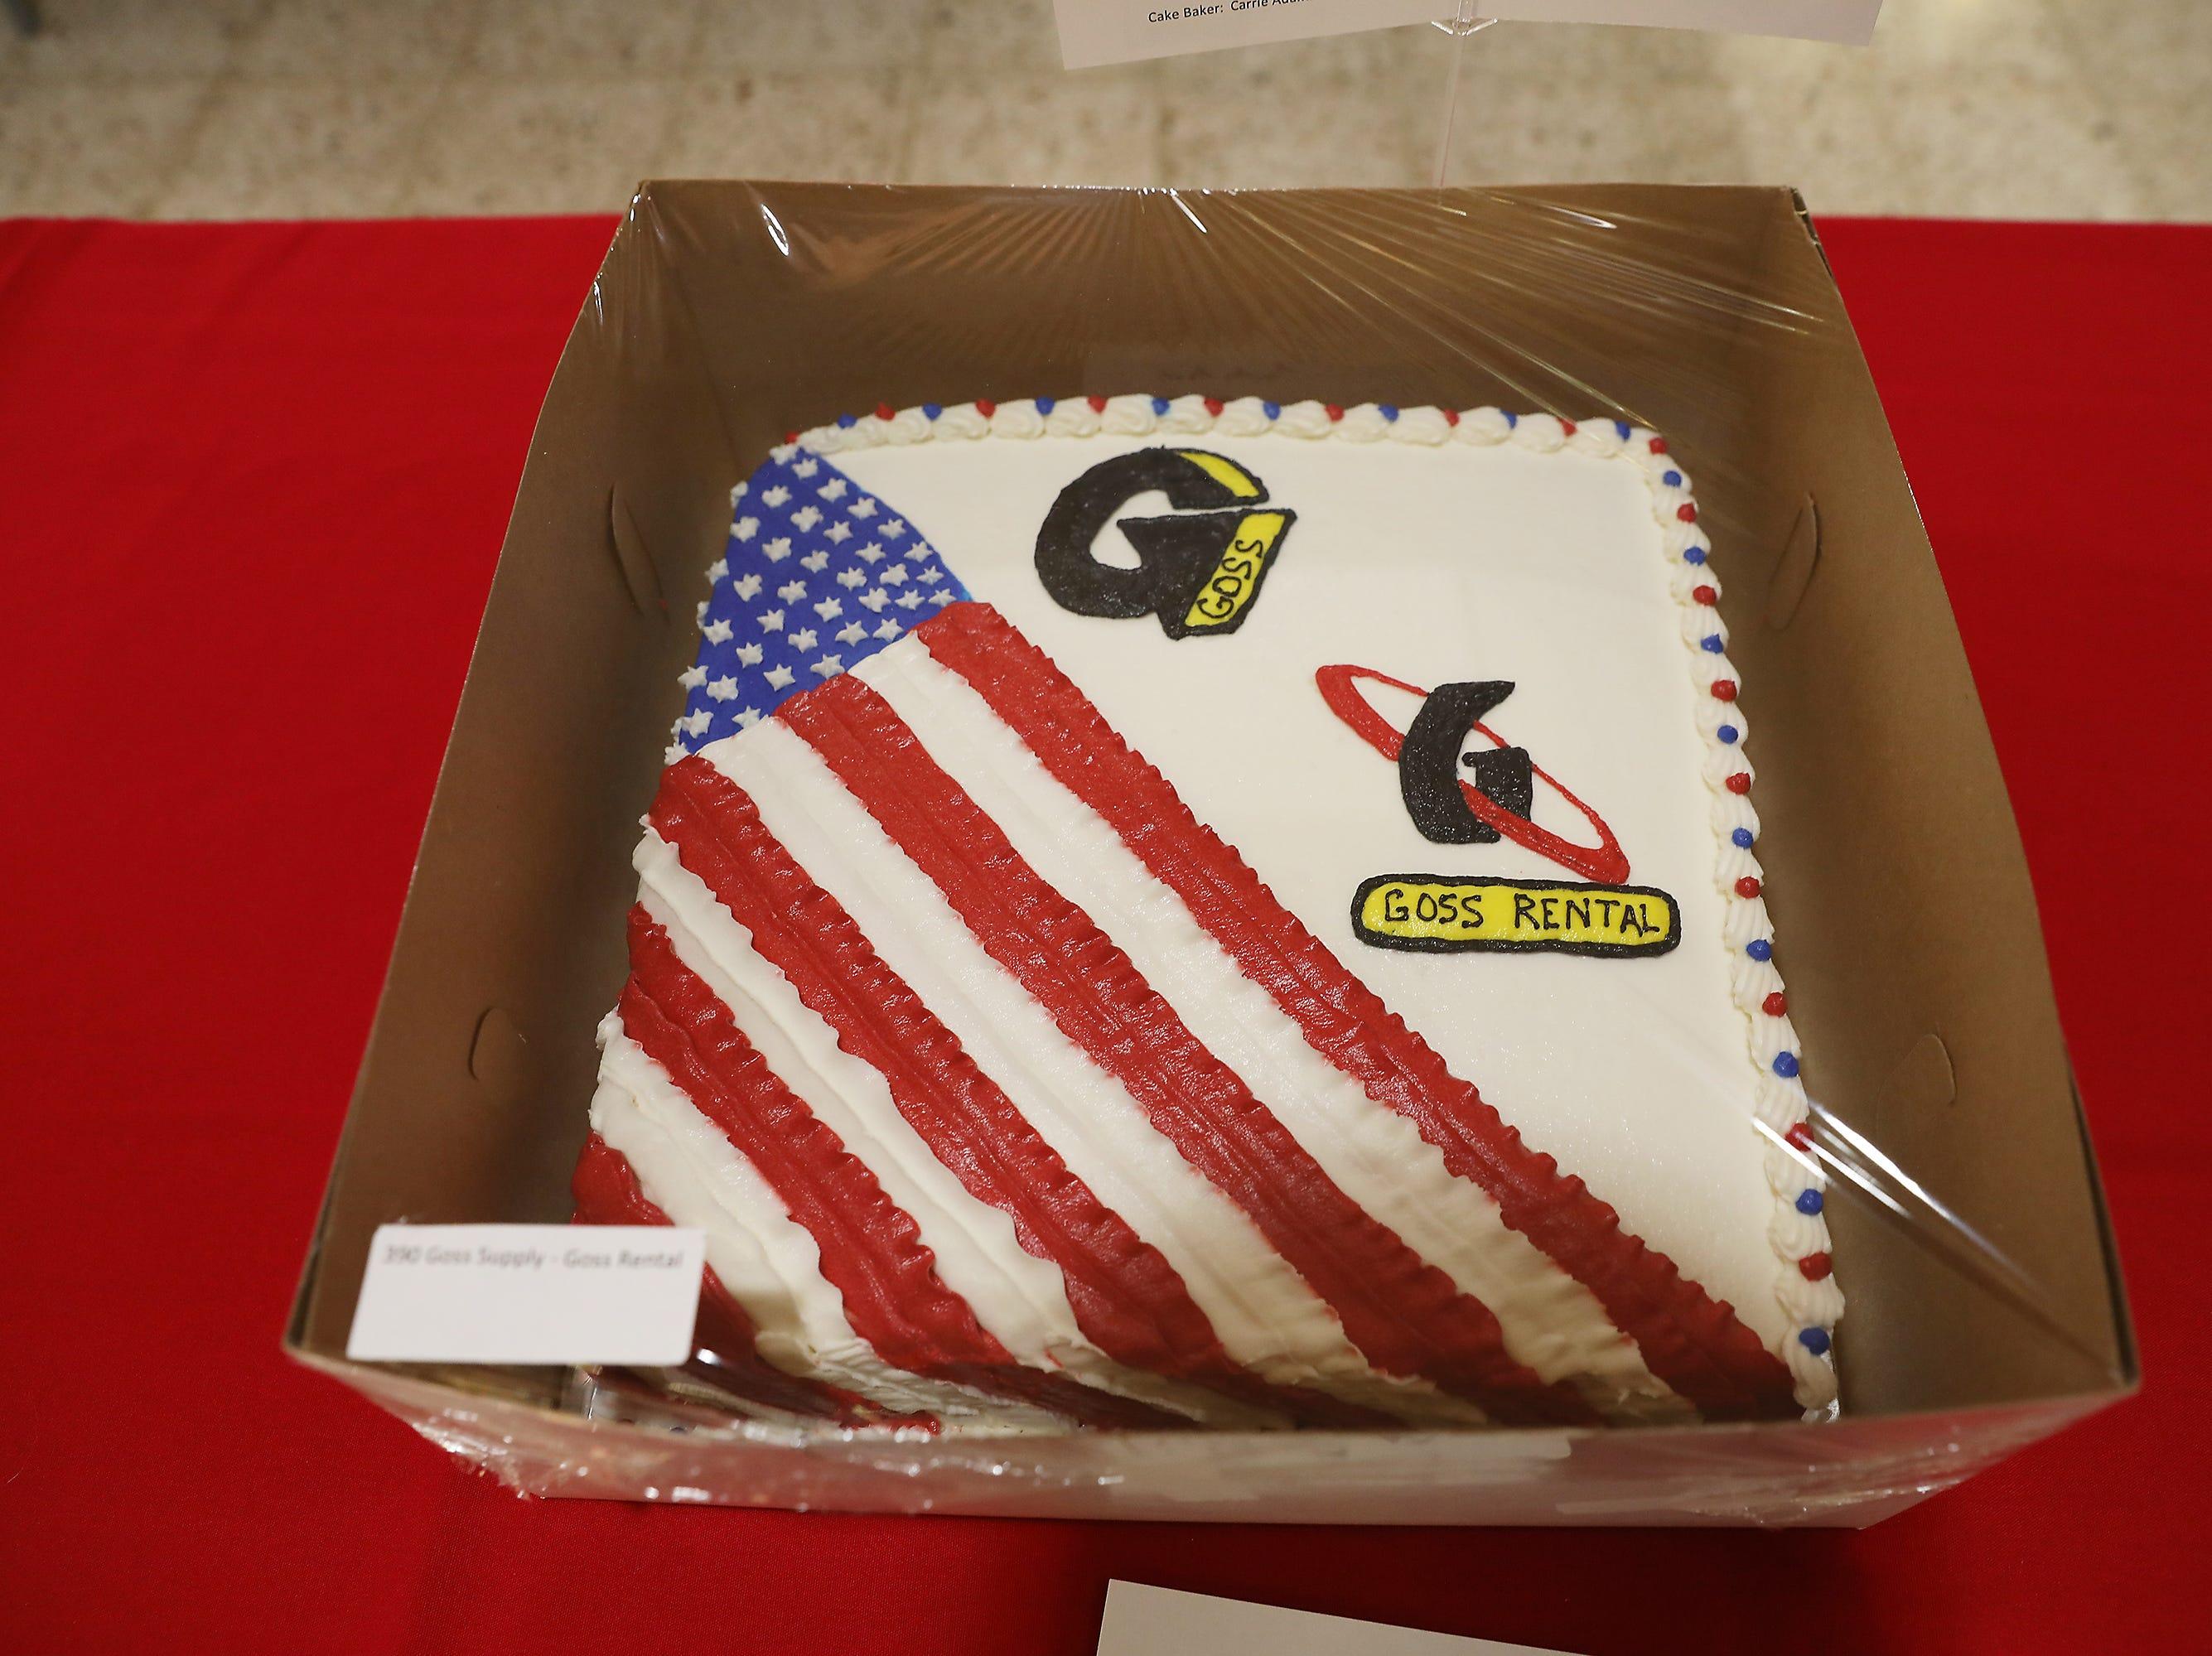 "4:45 P.M. Friday cake 390 Goss Supply Goss Rental - wooden 18"" x 35"" flag; $390"